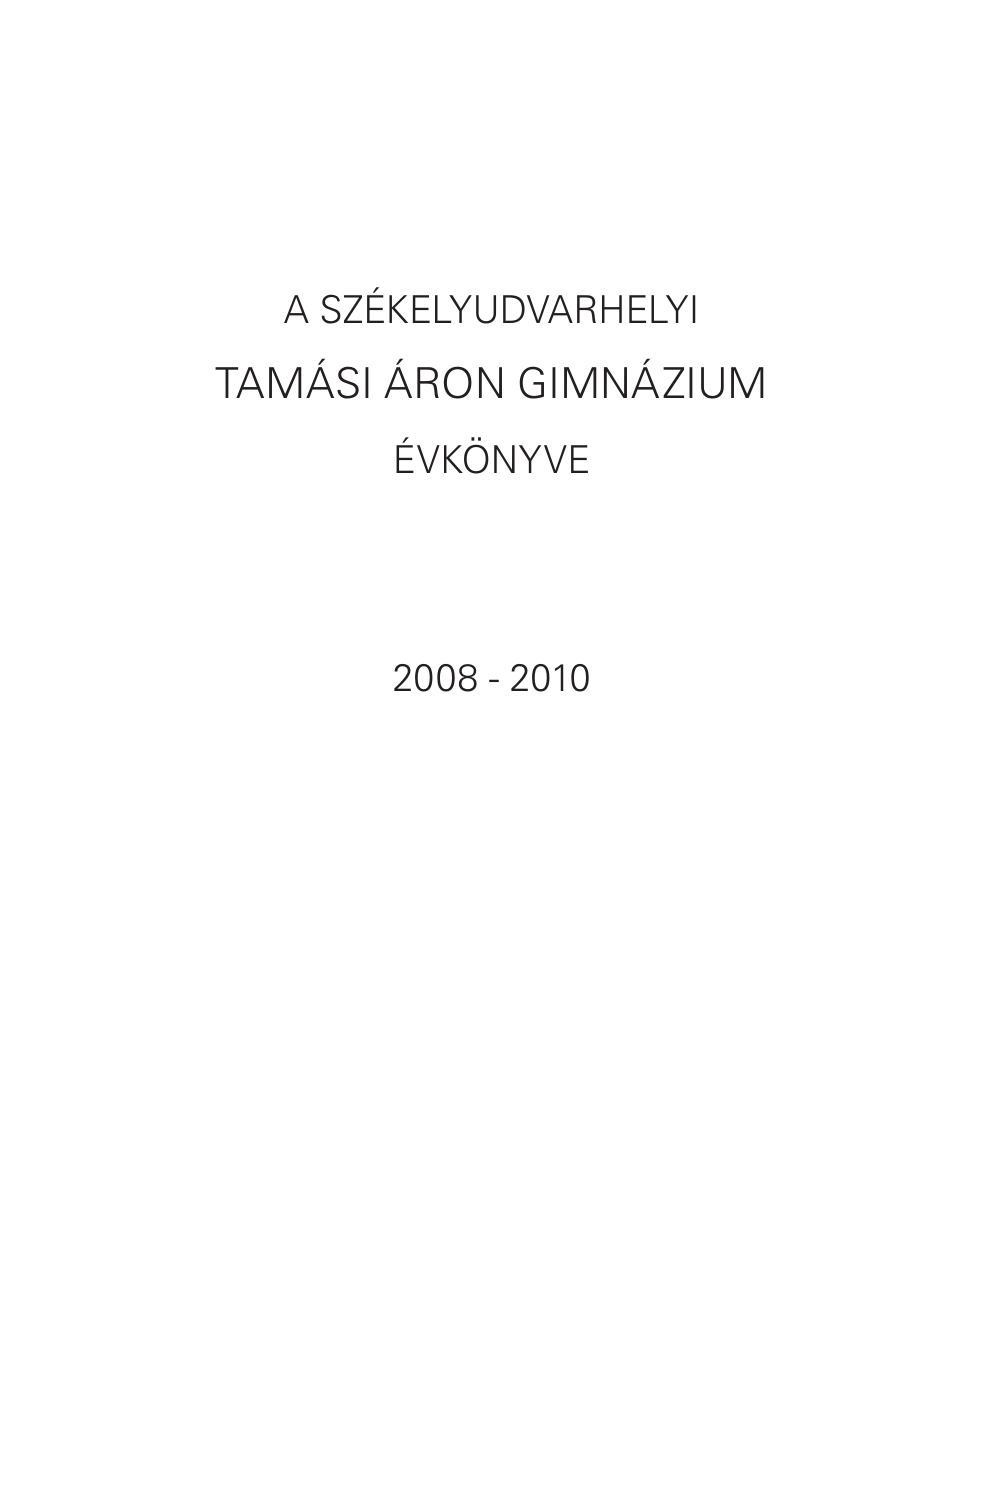 Evkonyv 2008 2010 by Tamási Áron Gimnázium - issuu eec908315a